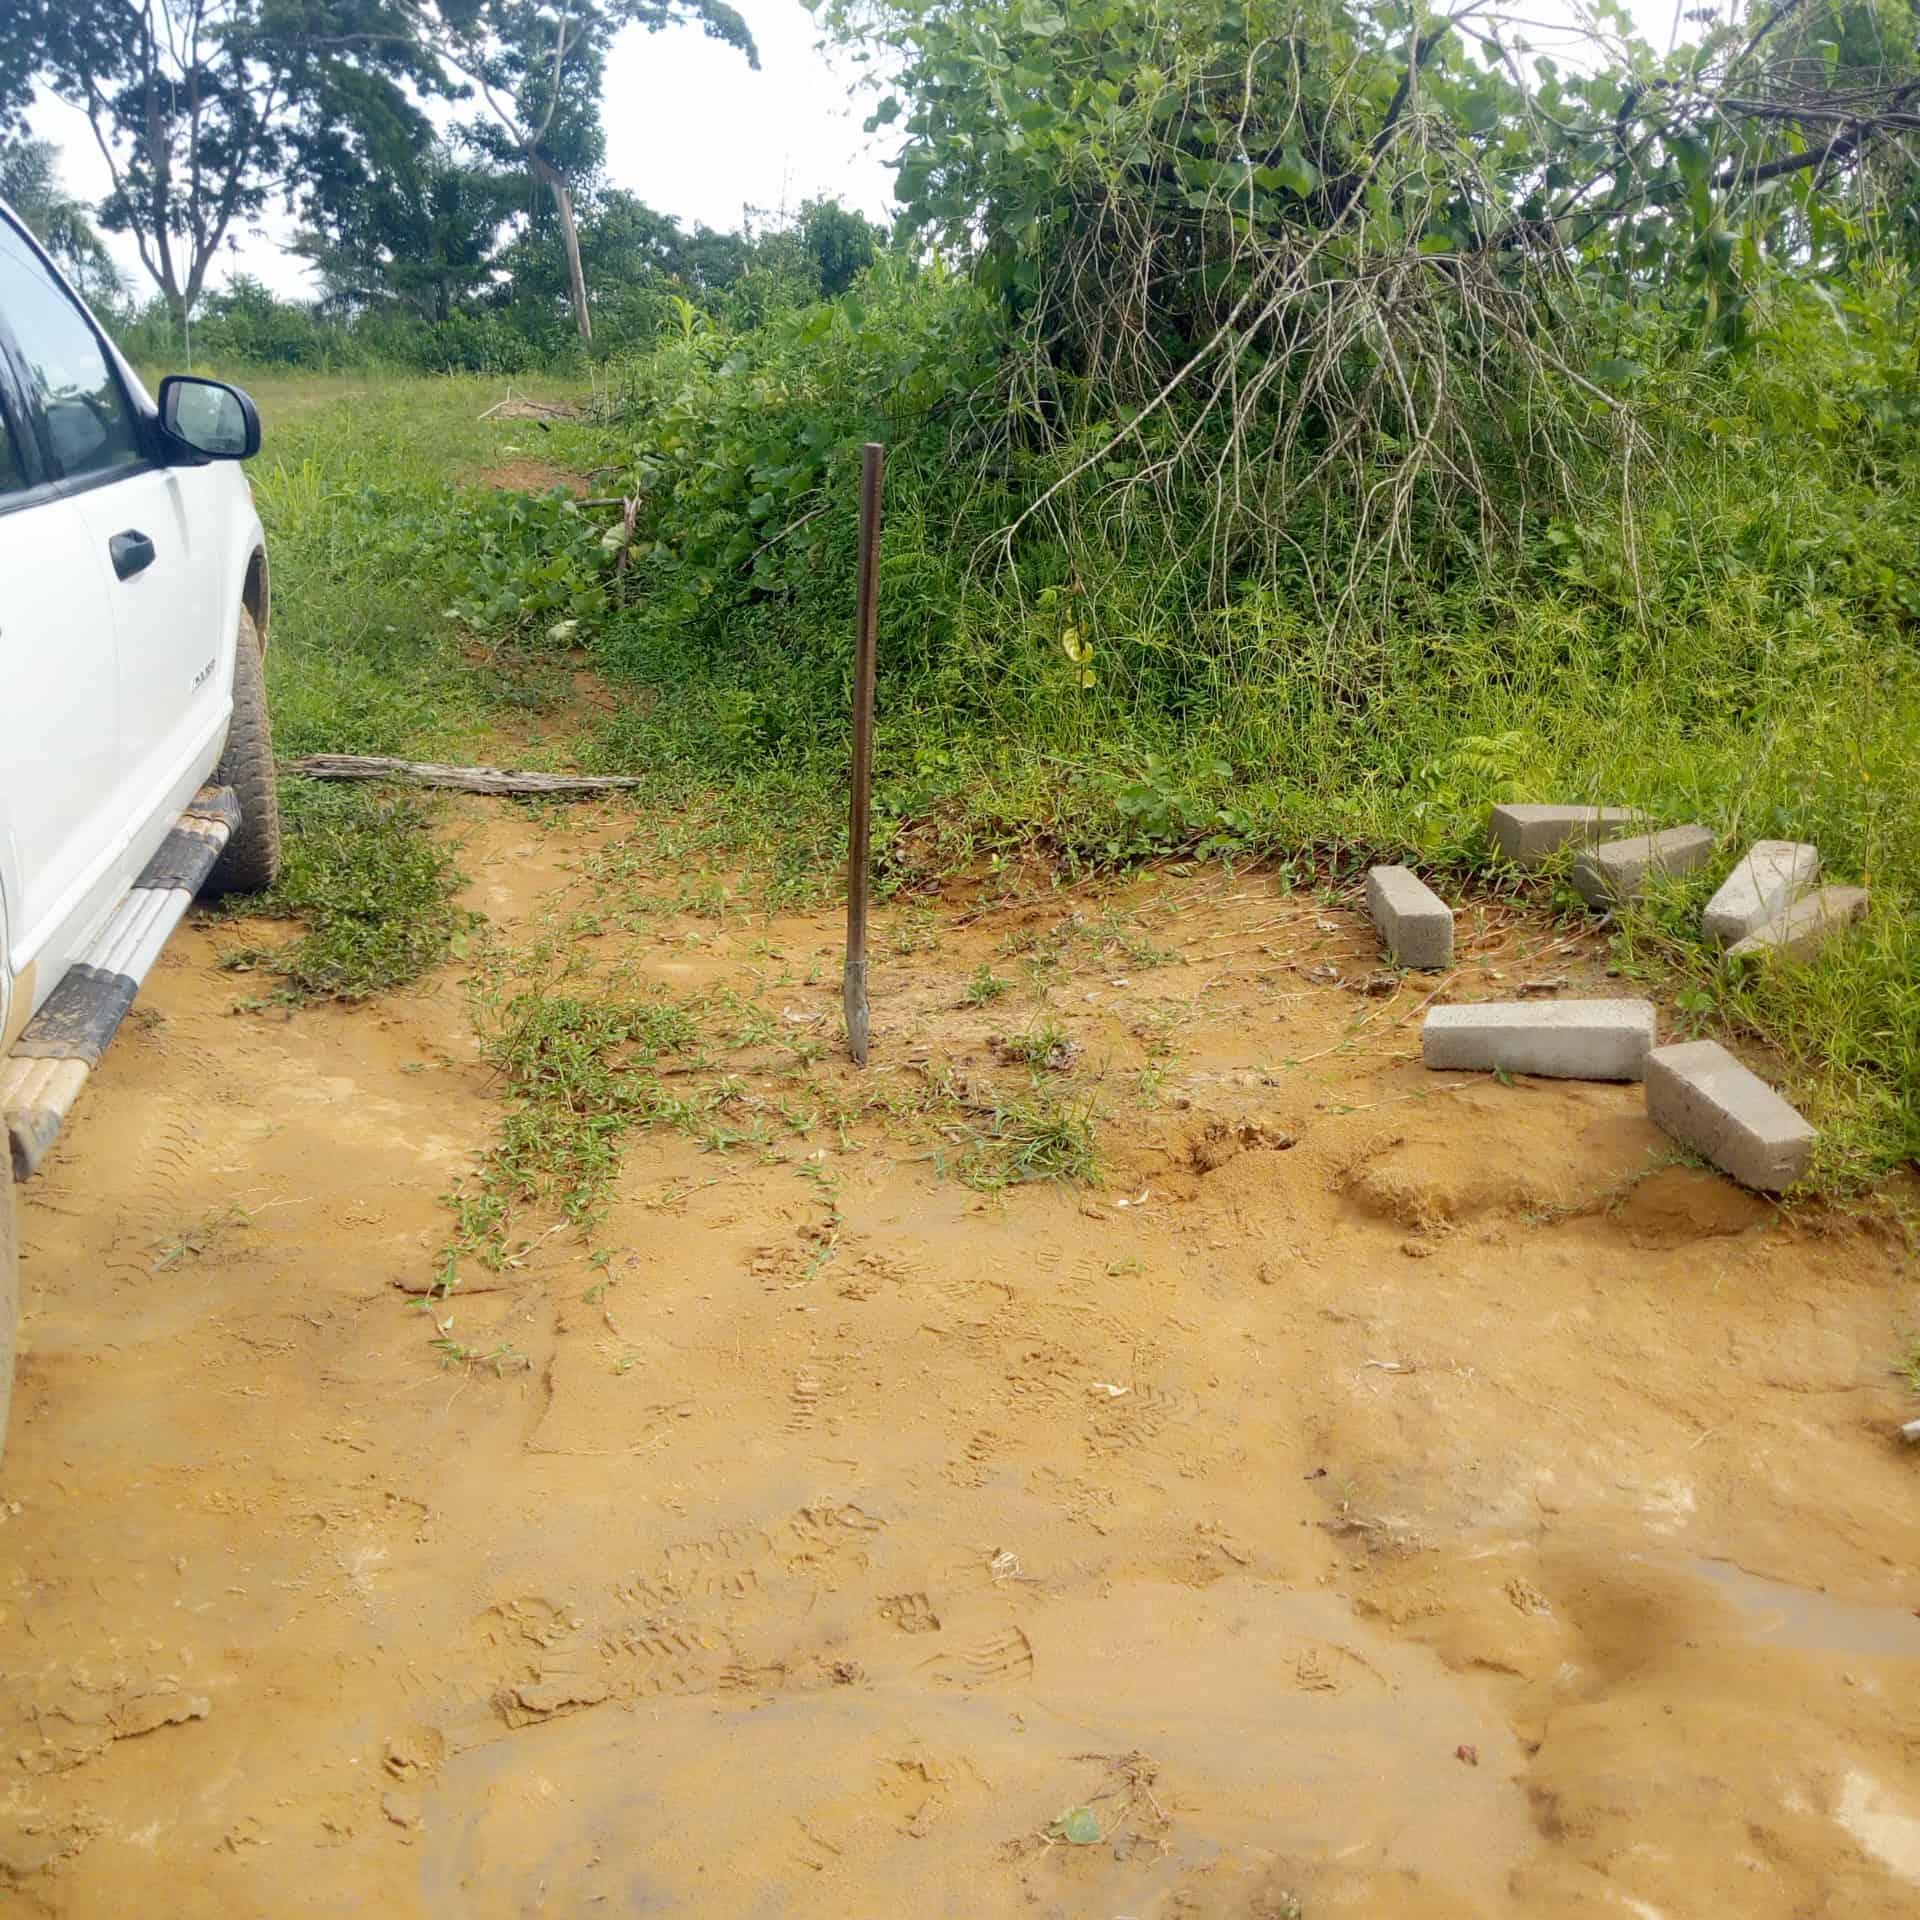 Land for sale at Douala, Bassa, Pk31 - 10000 m2 - 7 000 000 FCFA